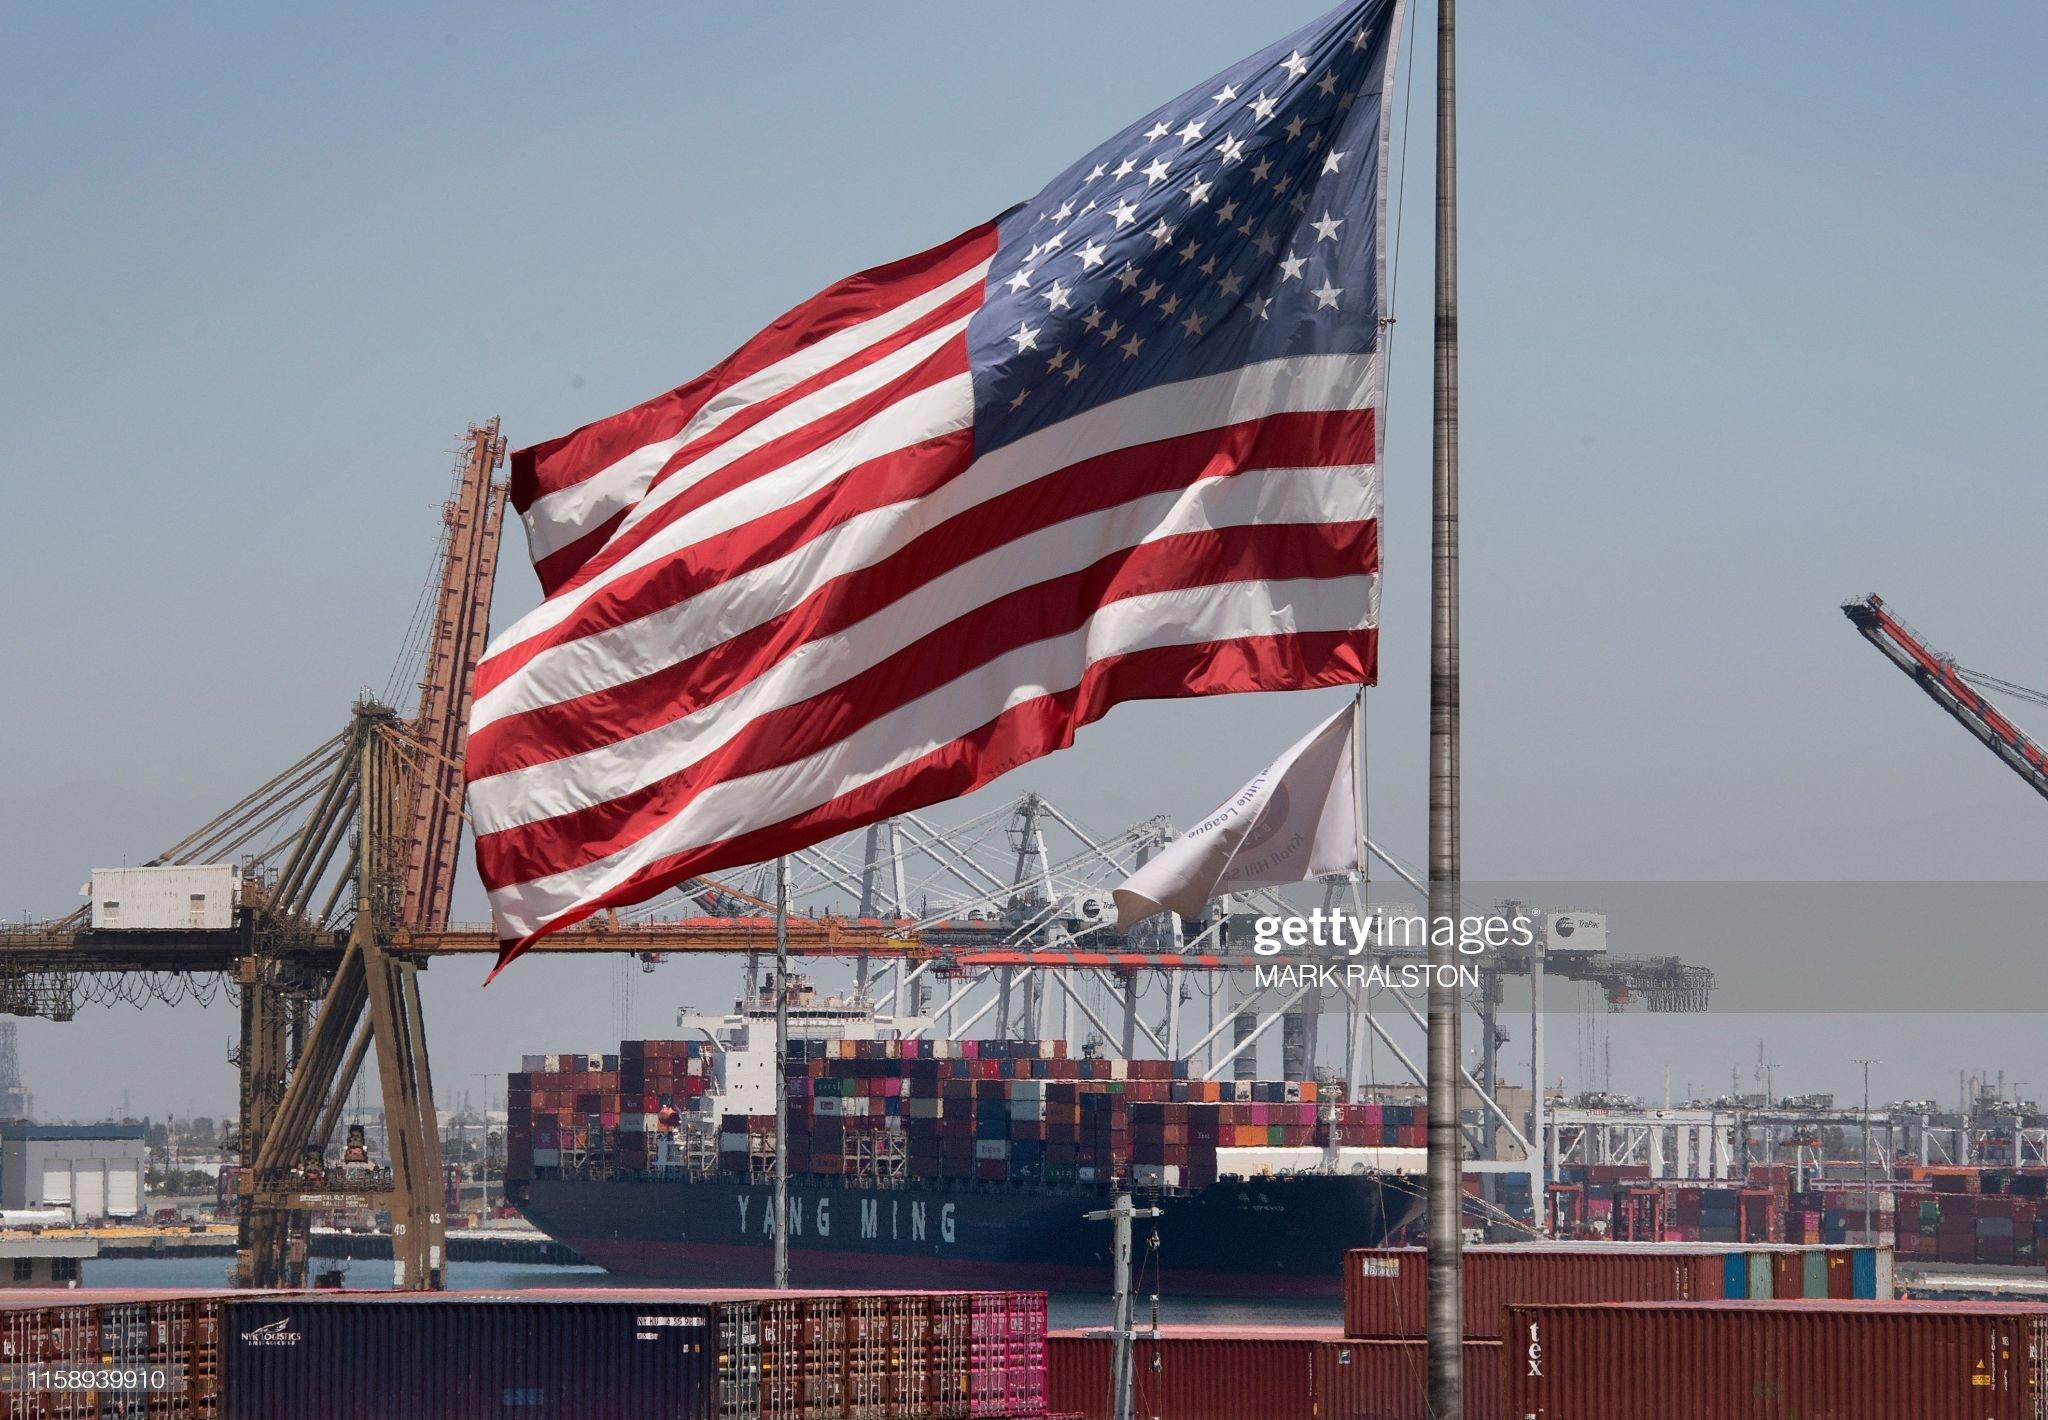 China-politics-trade-tariff-US-CHINA-ECONOMY-POLITICS-TRADE-TARI : News Photo